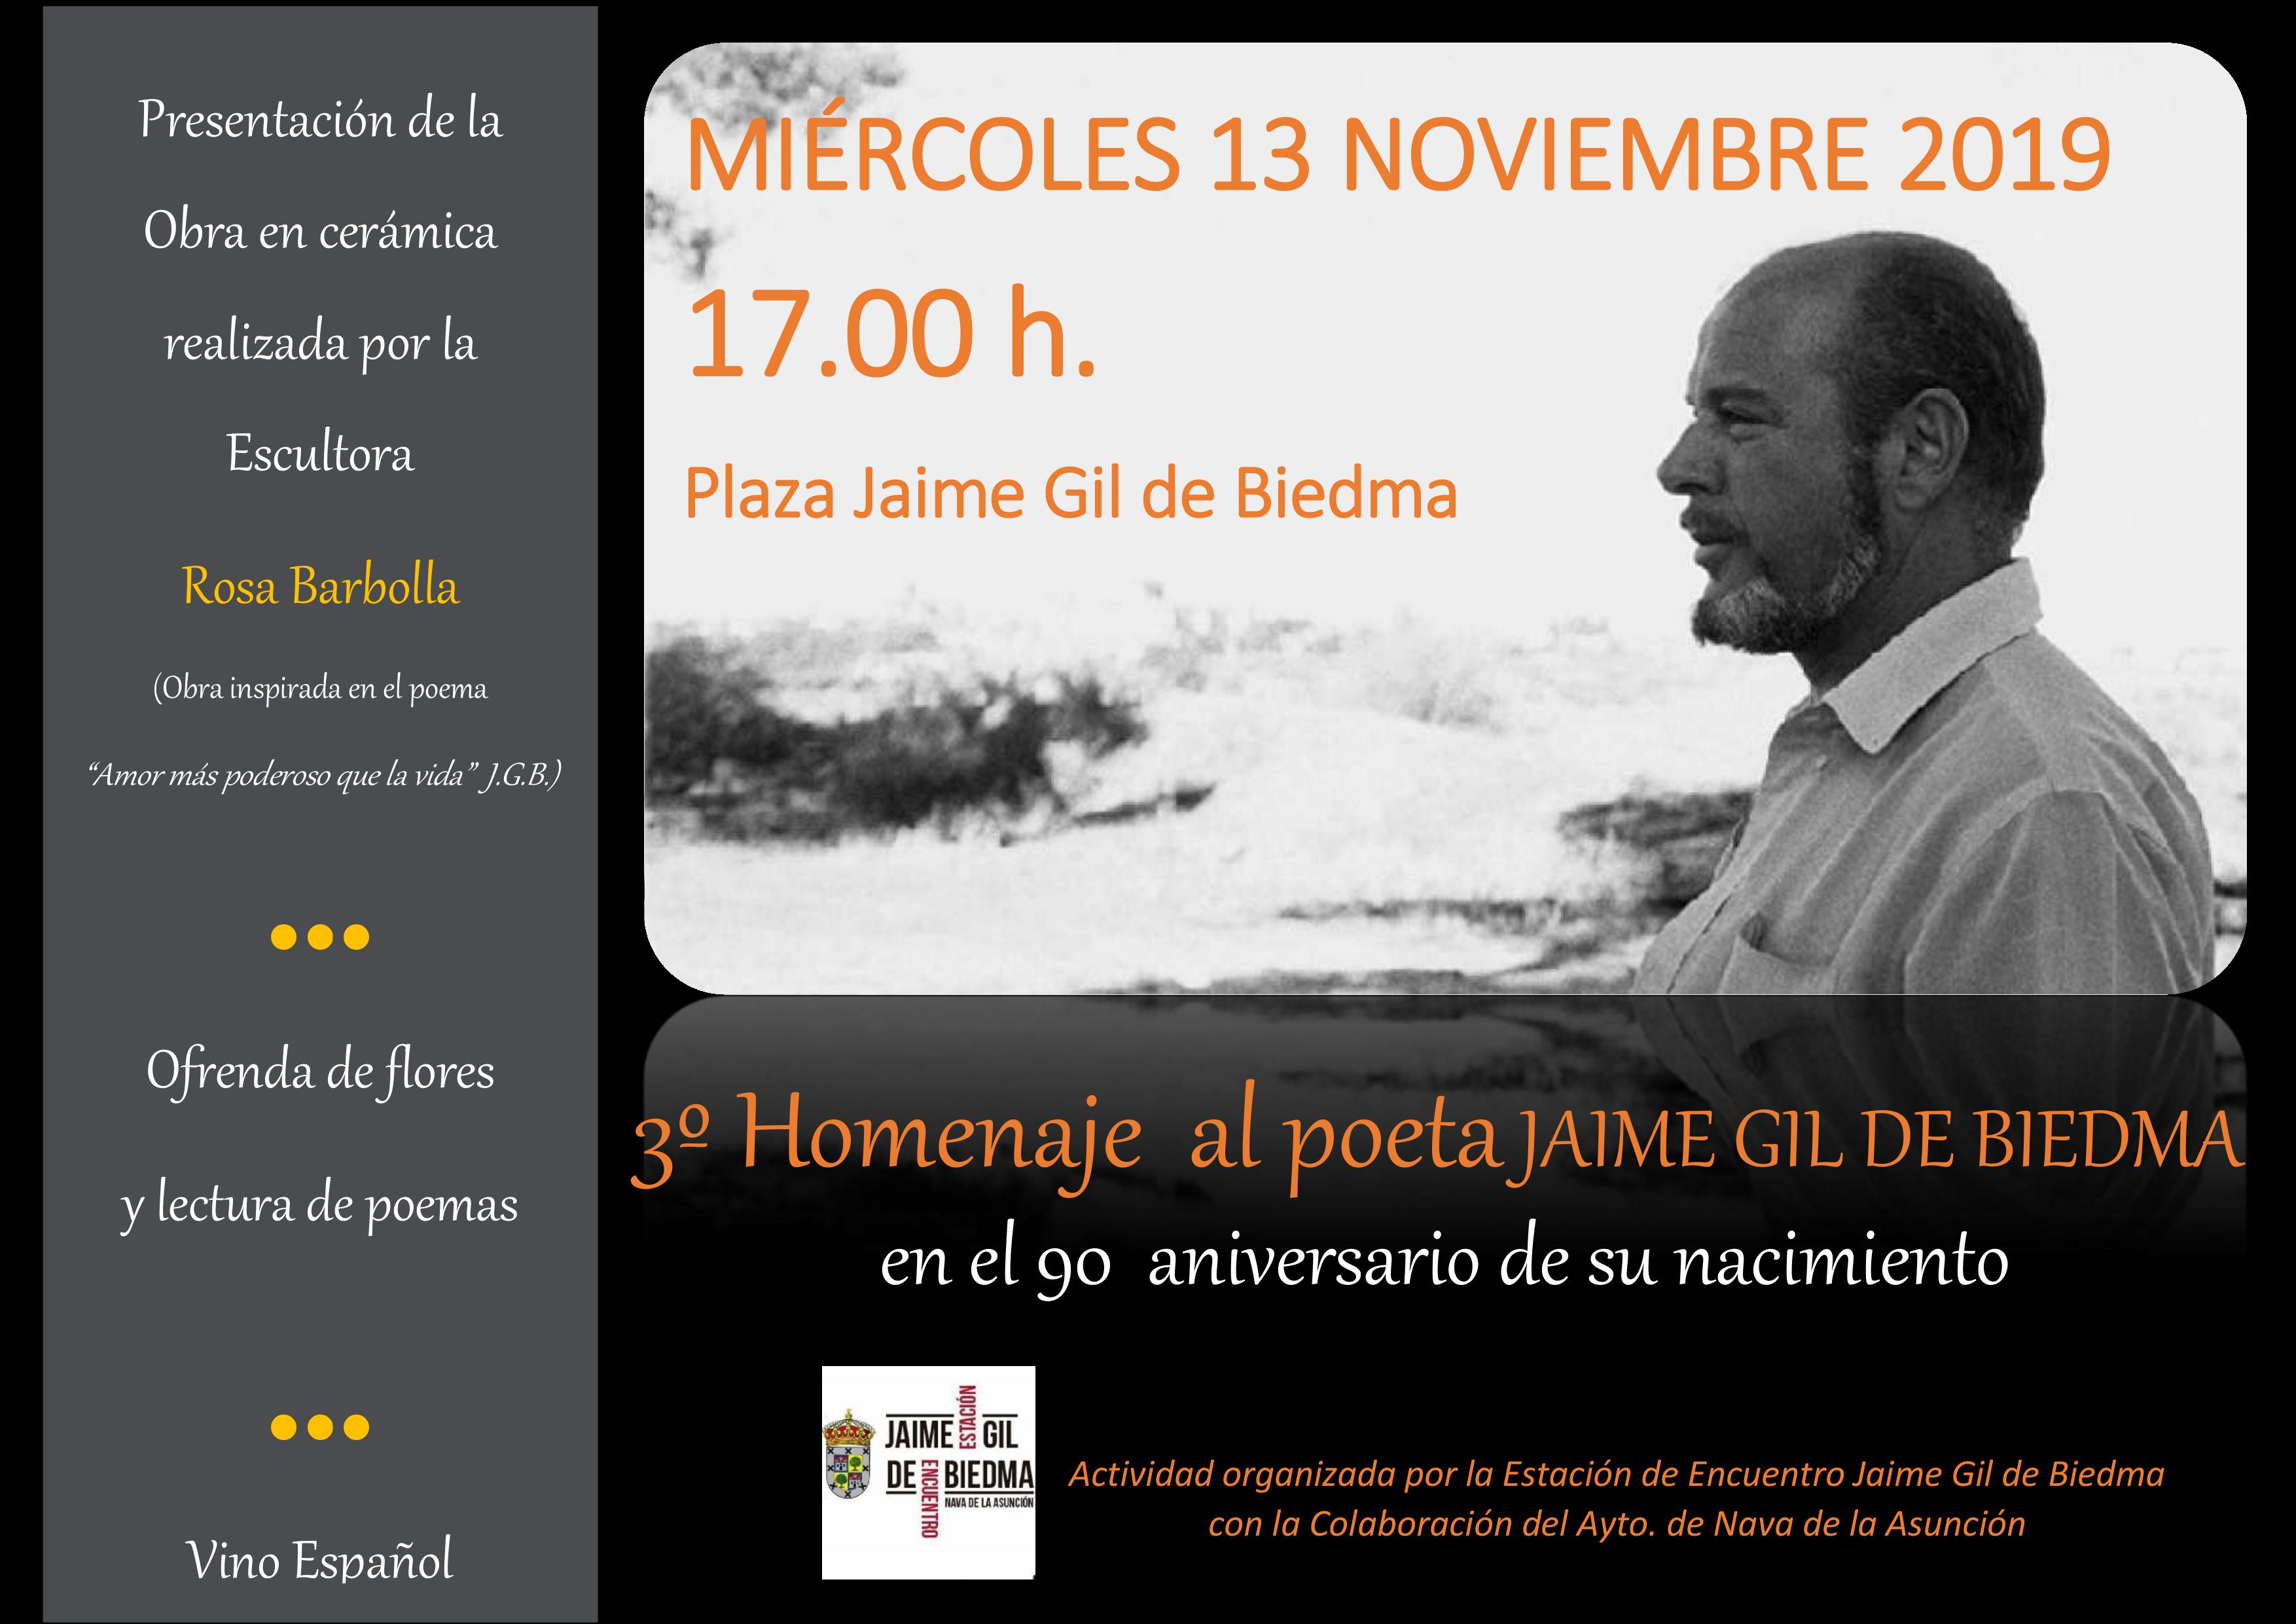 TRIBUTE TO JAIME GIL DE BIEDMA